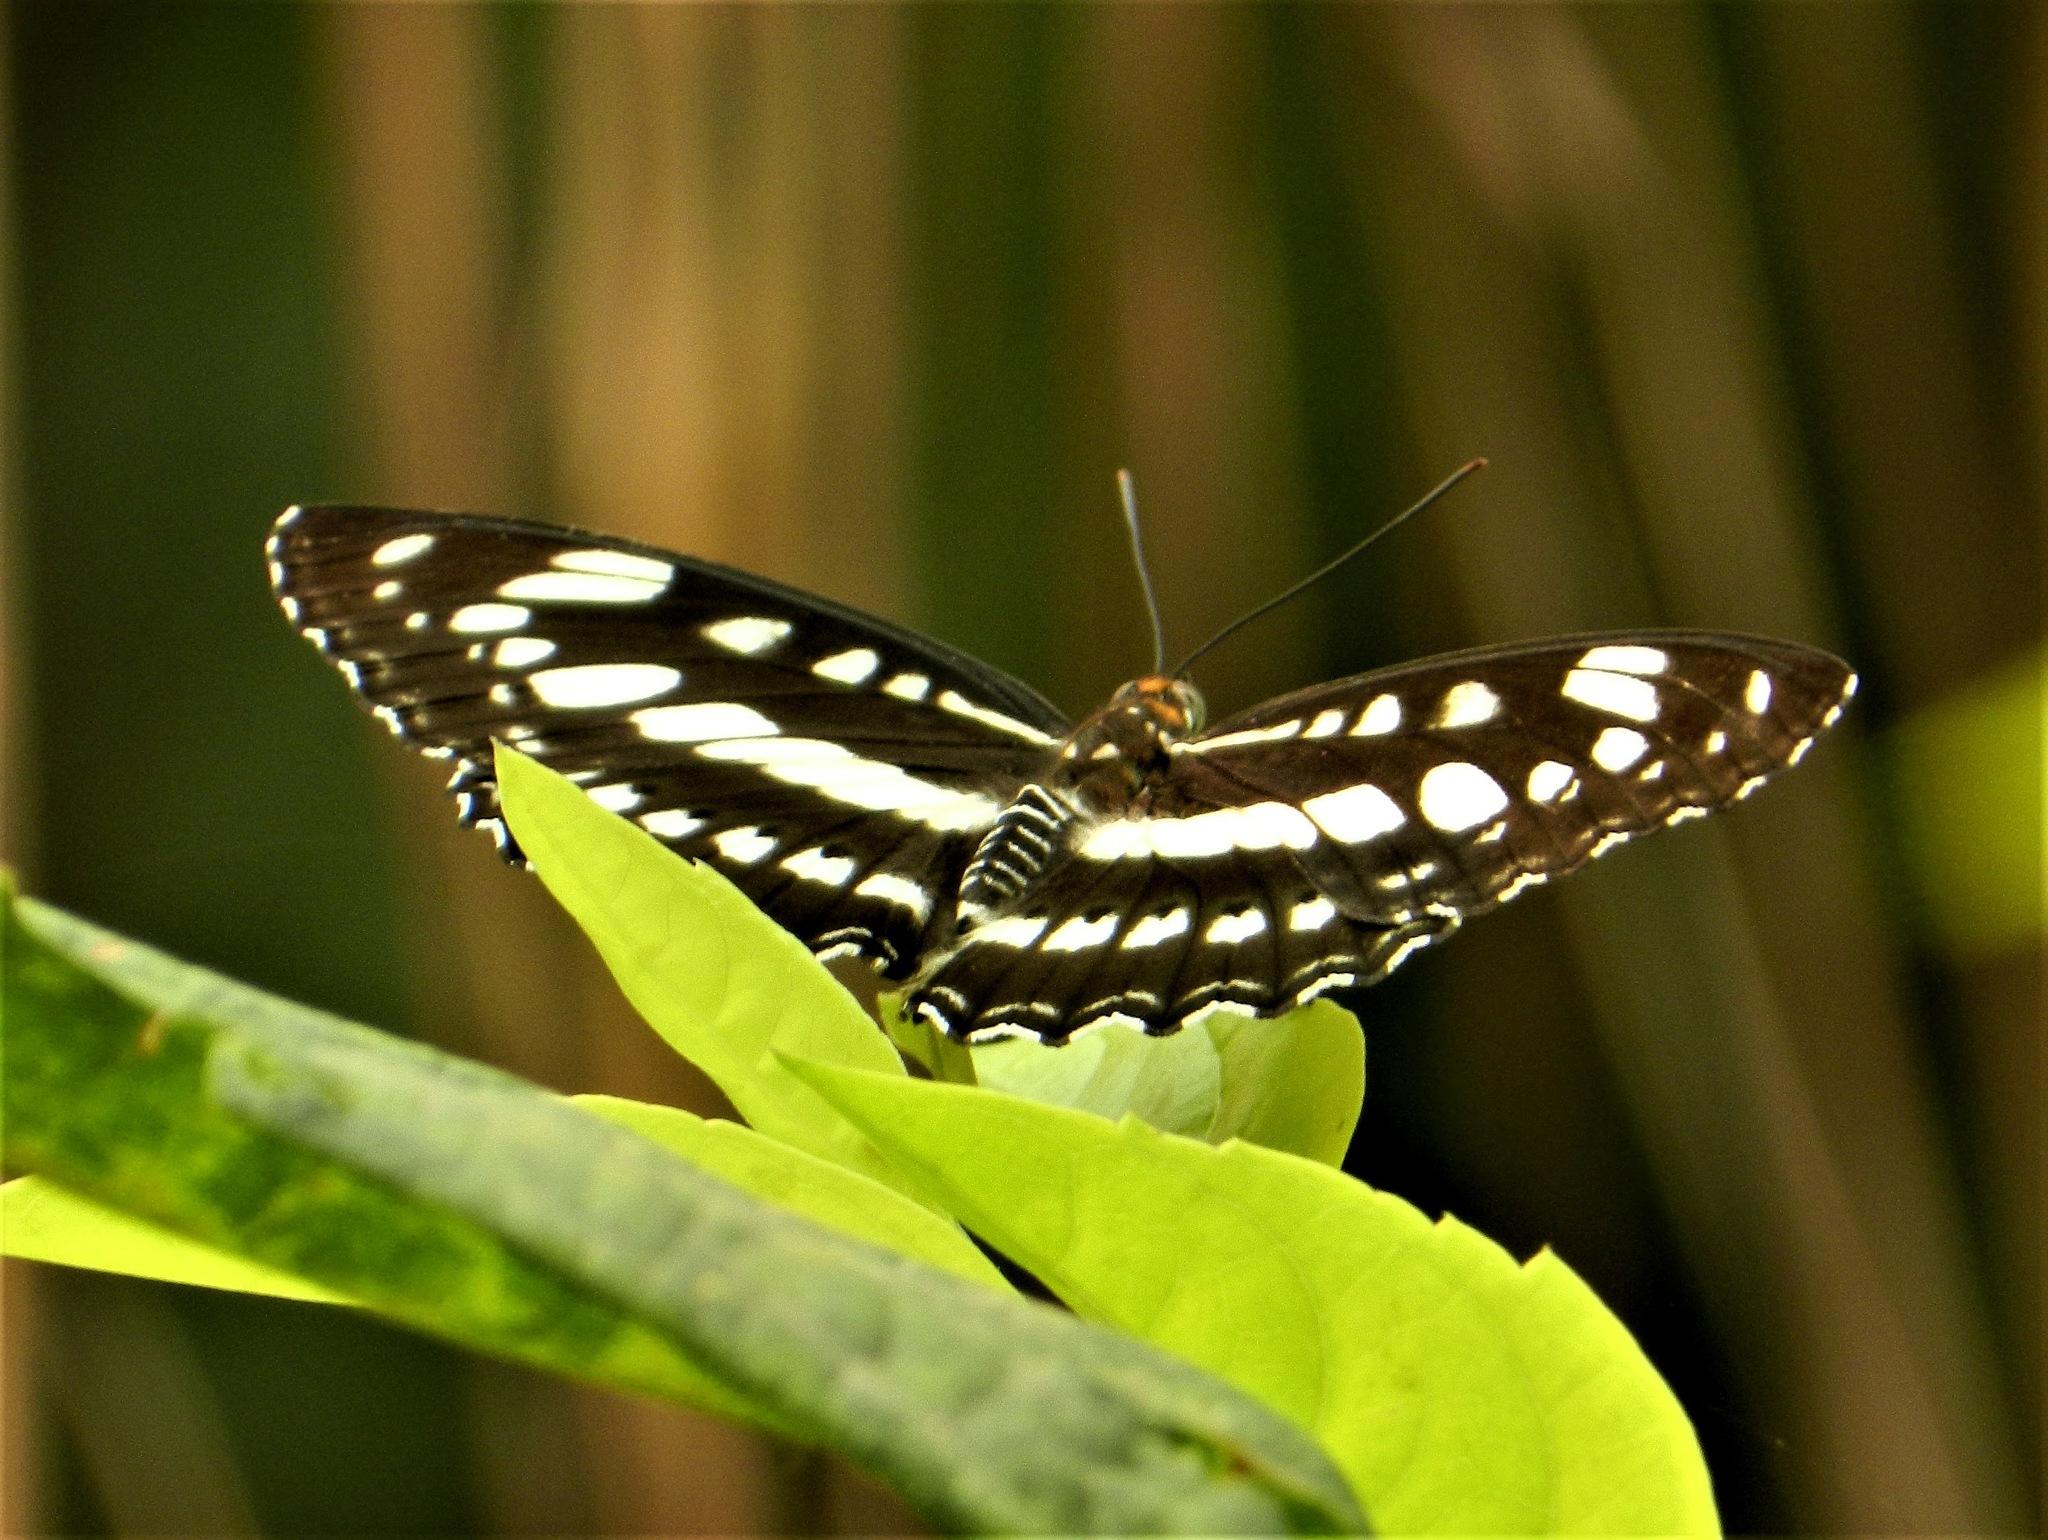 Moth by Srijini Pal